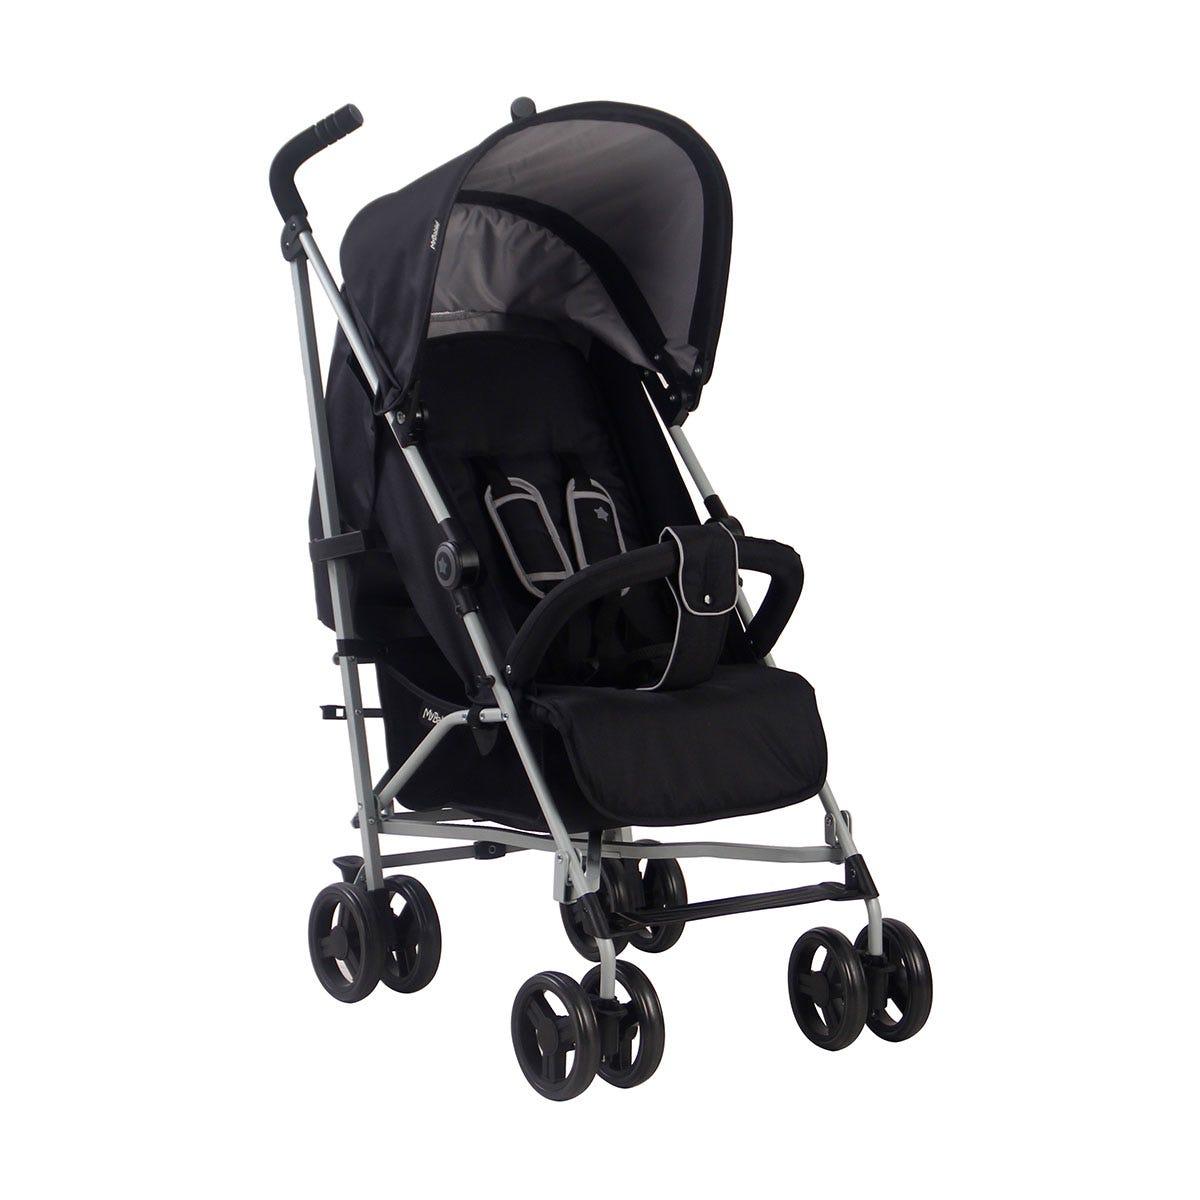 My Babiie MB02 Stroller - Black